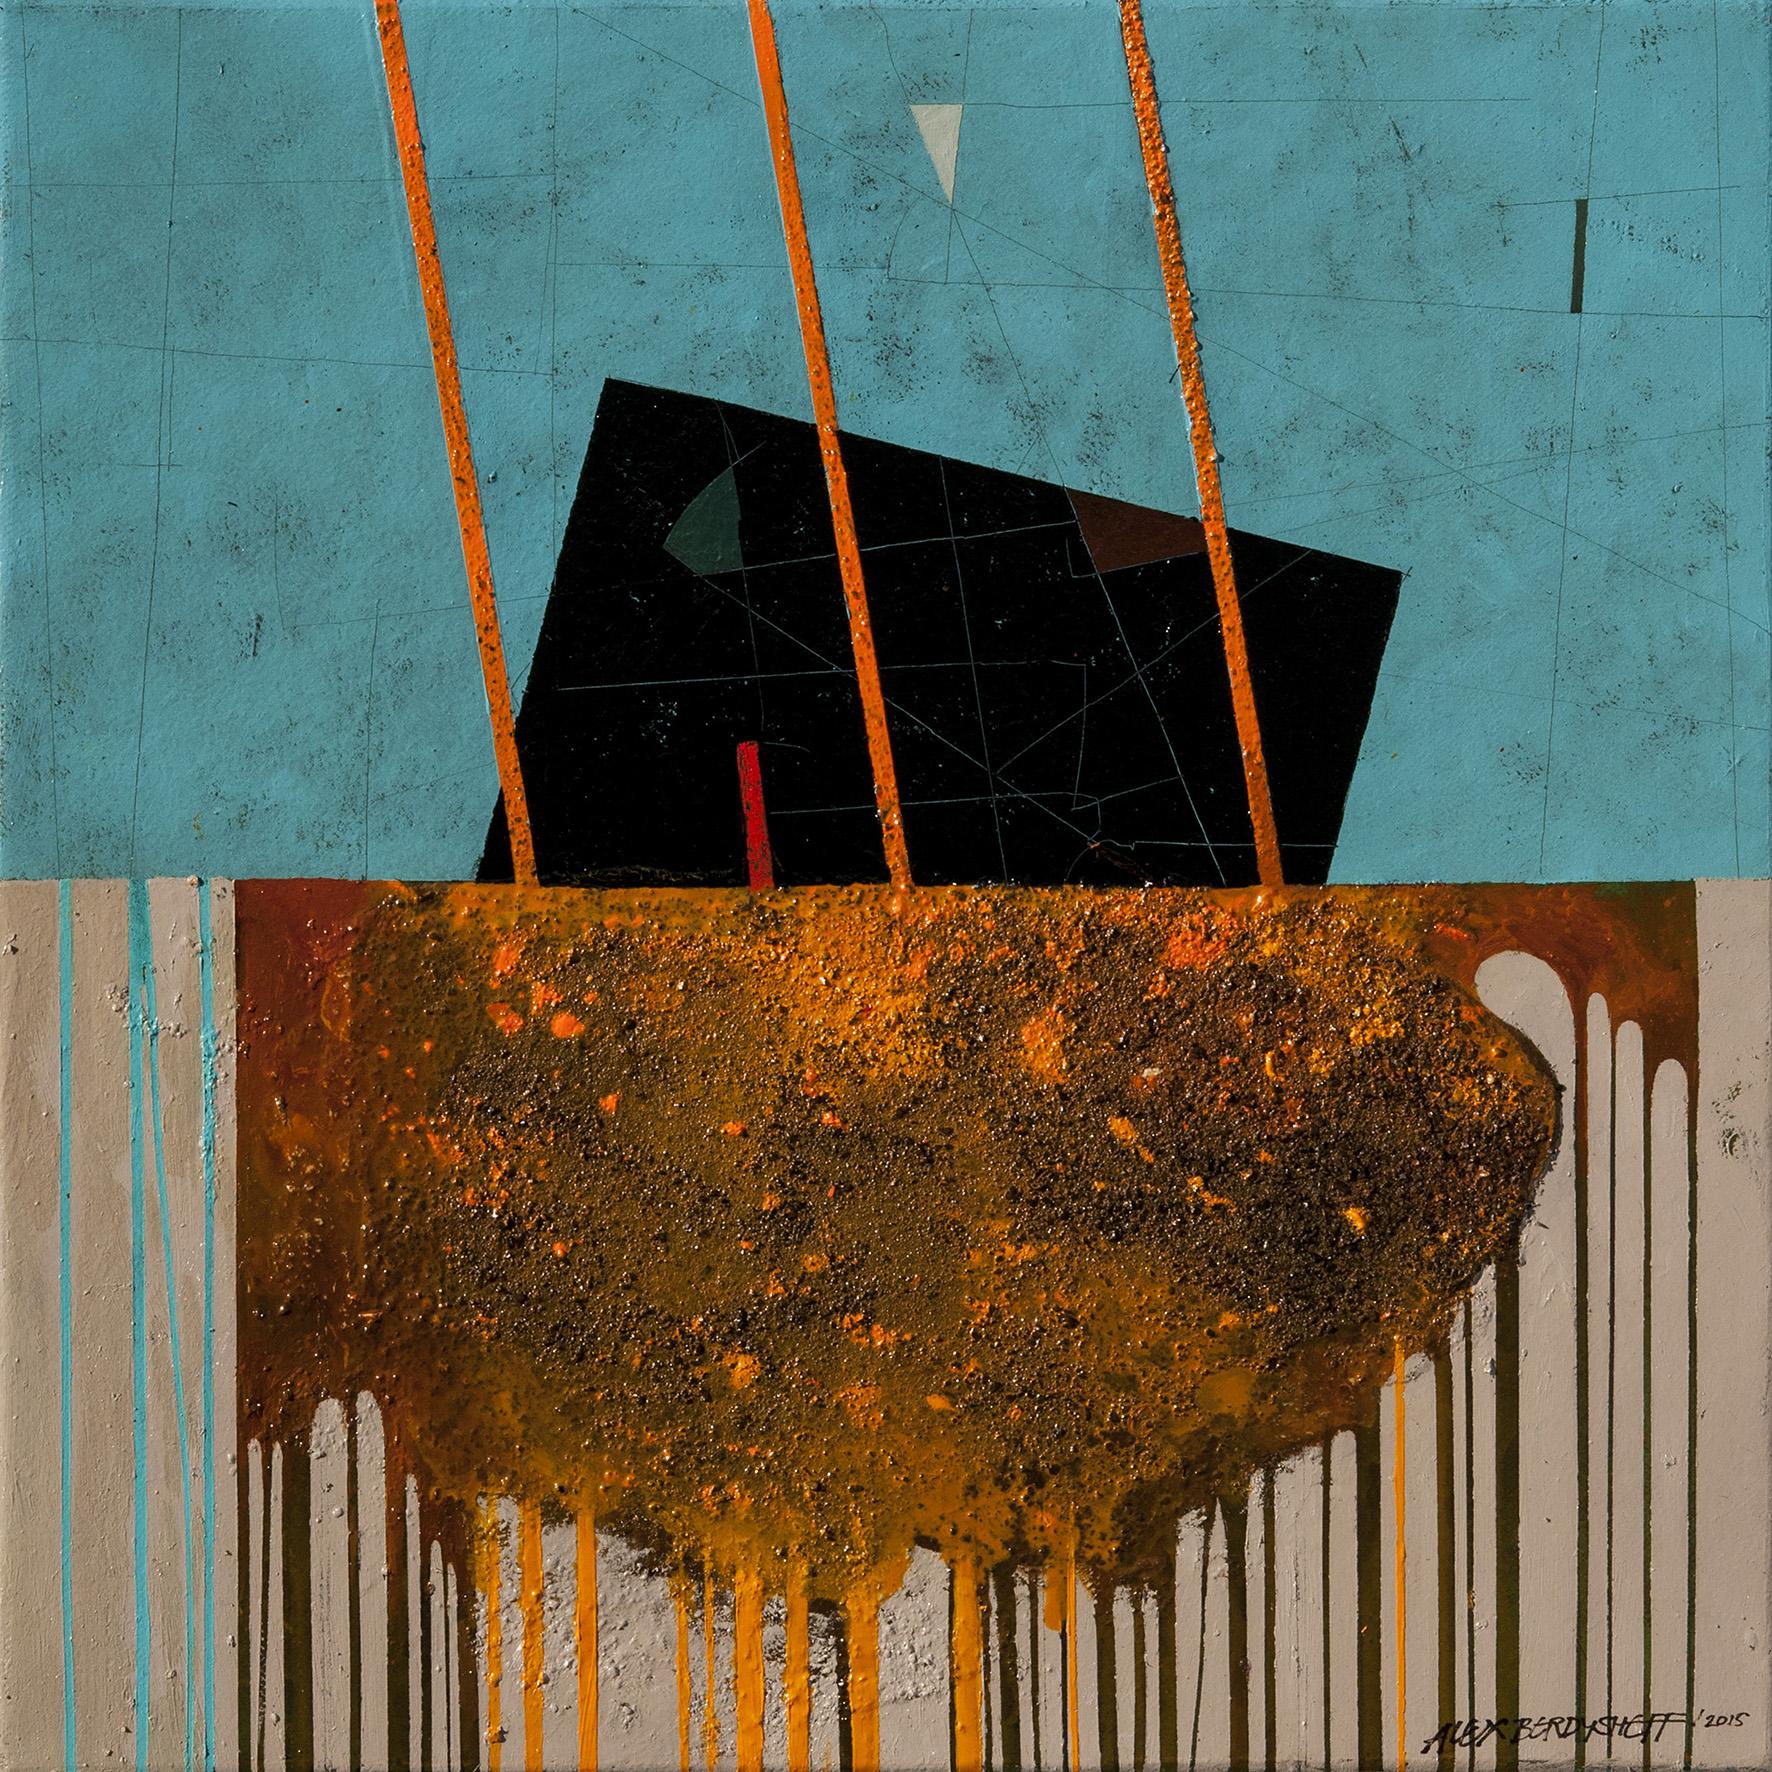 Rhythm V, oil on canvas, 46x46 cm, 2015